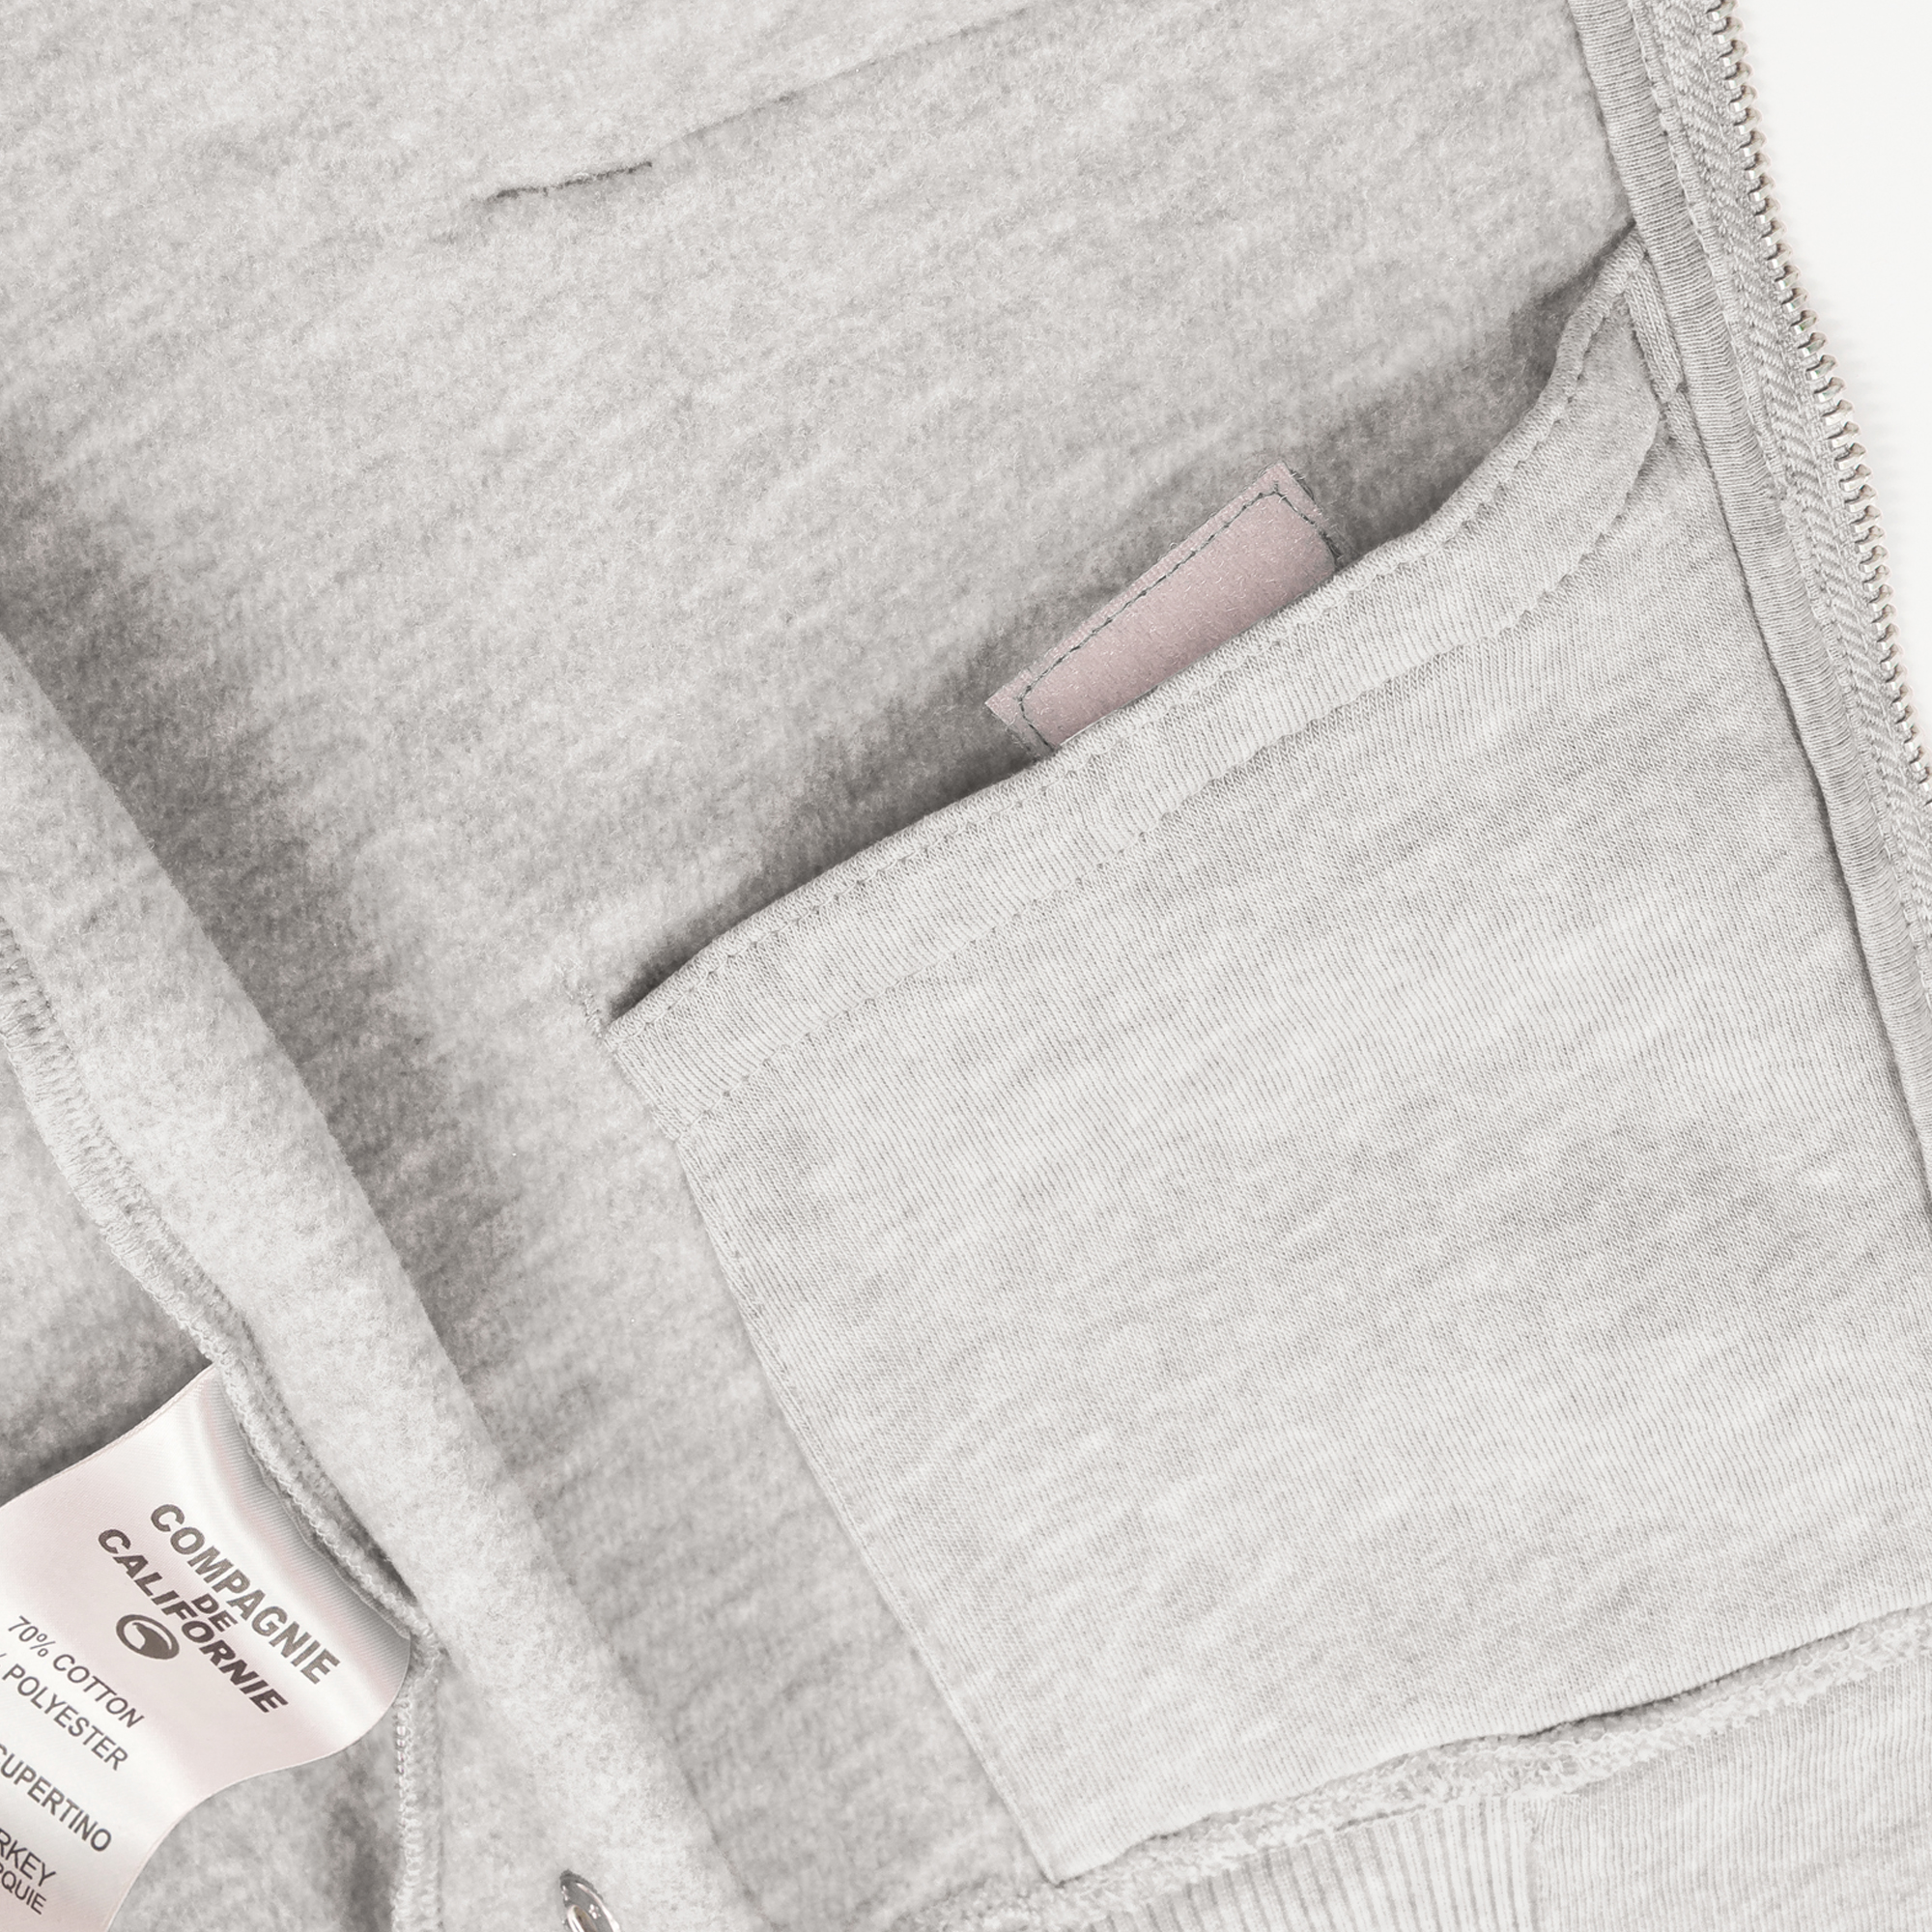 new cupertino hoodie zip heather grey 3.